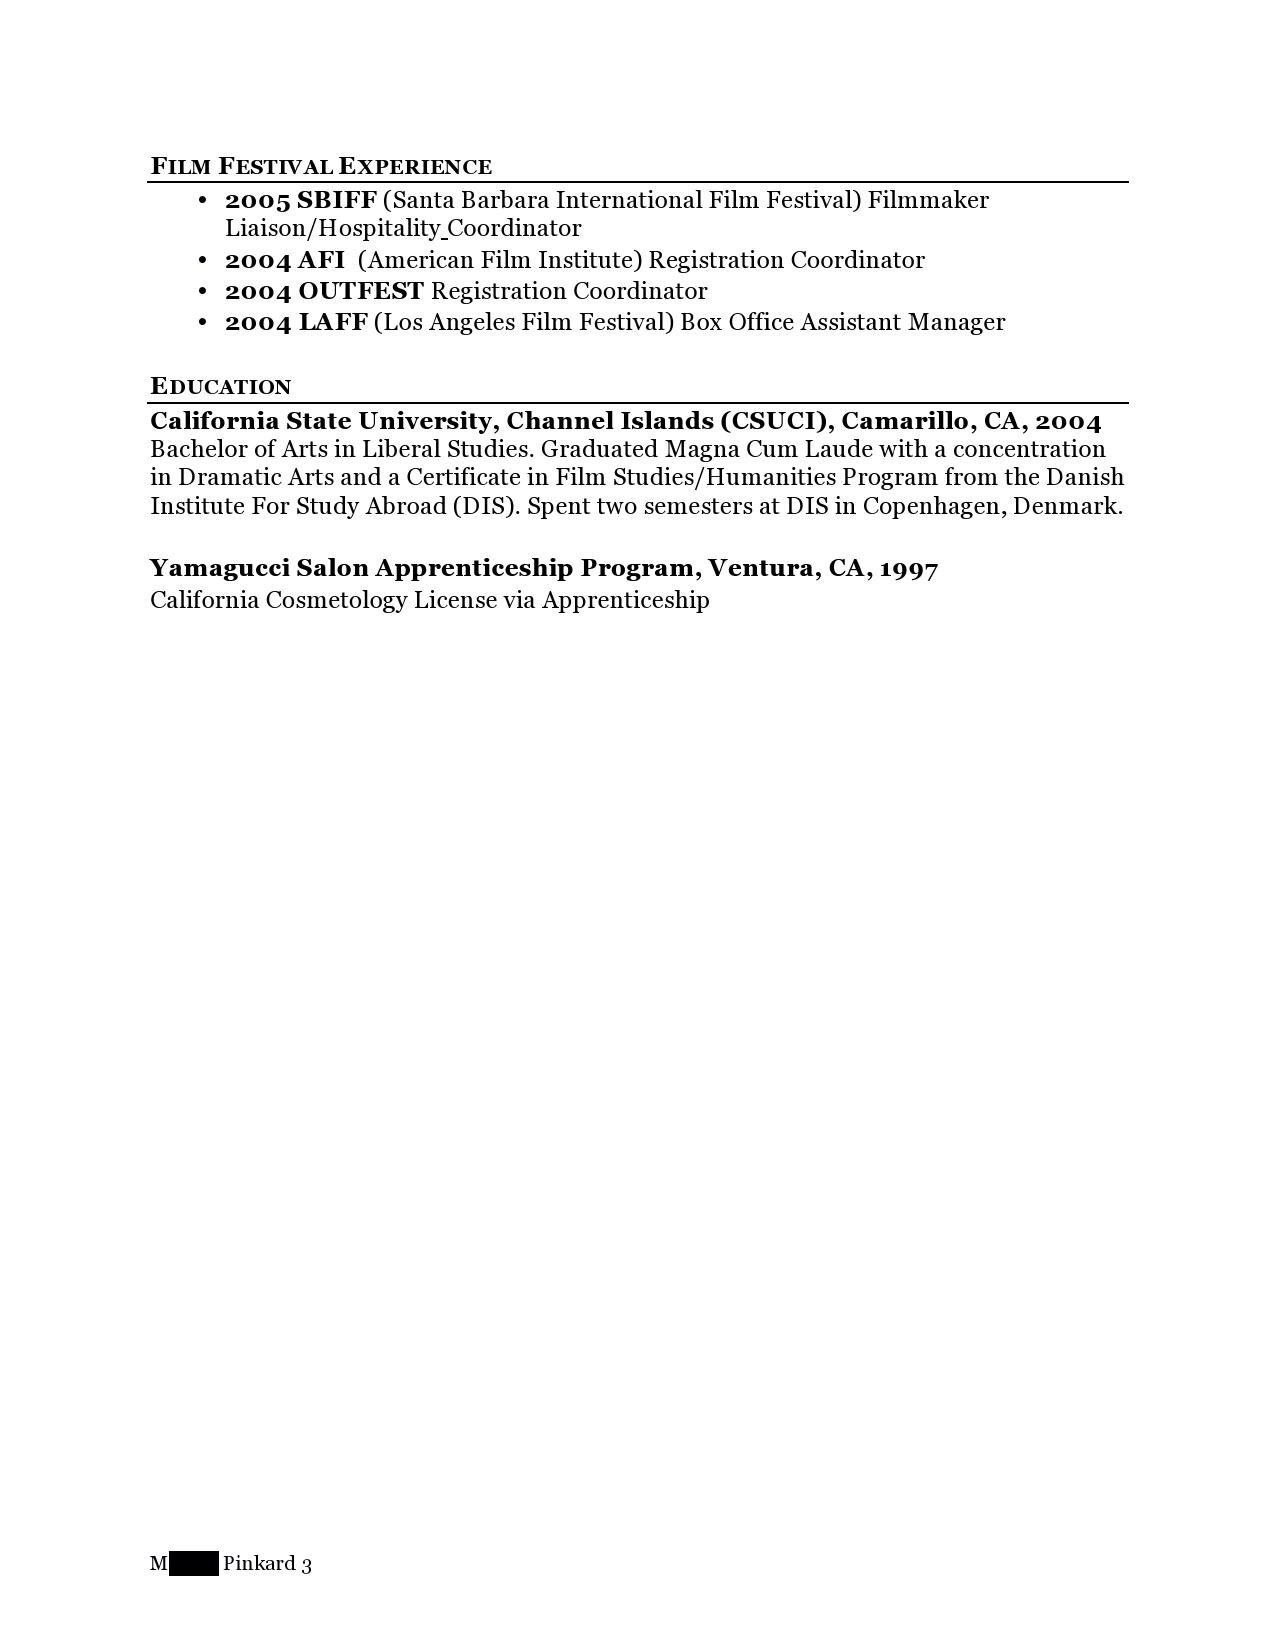 resume sporadic work history resume format examples resume sporadic work history rsum writing guide unfedu hello master resume project management hello resume meet